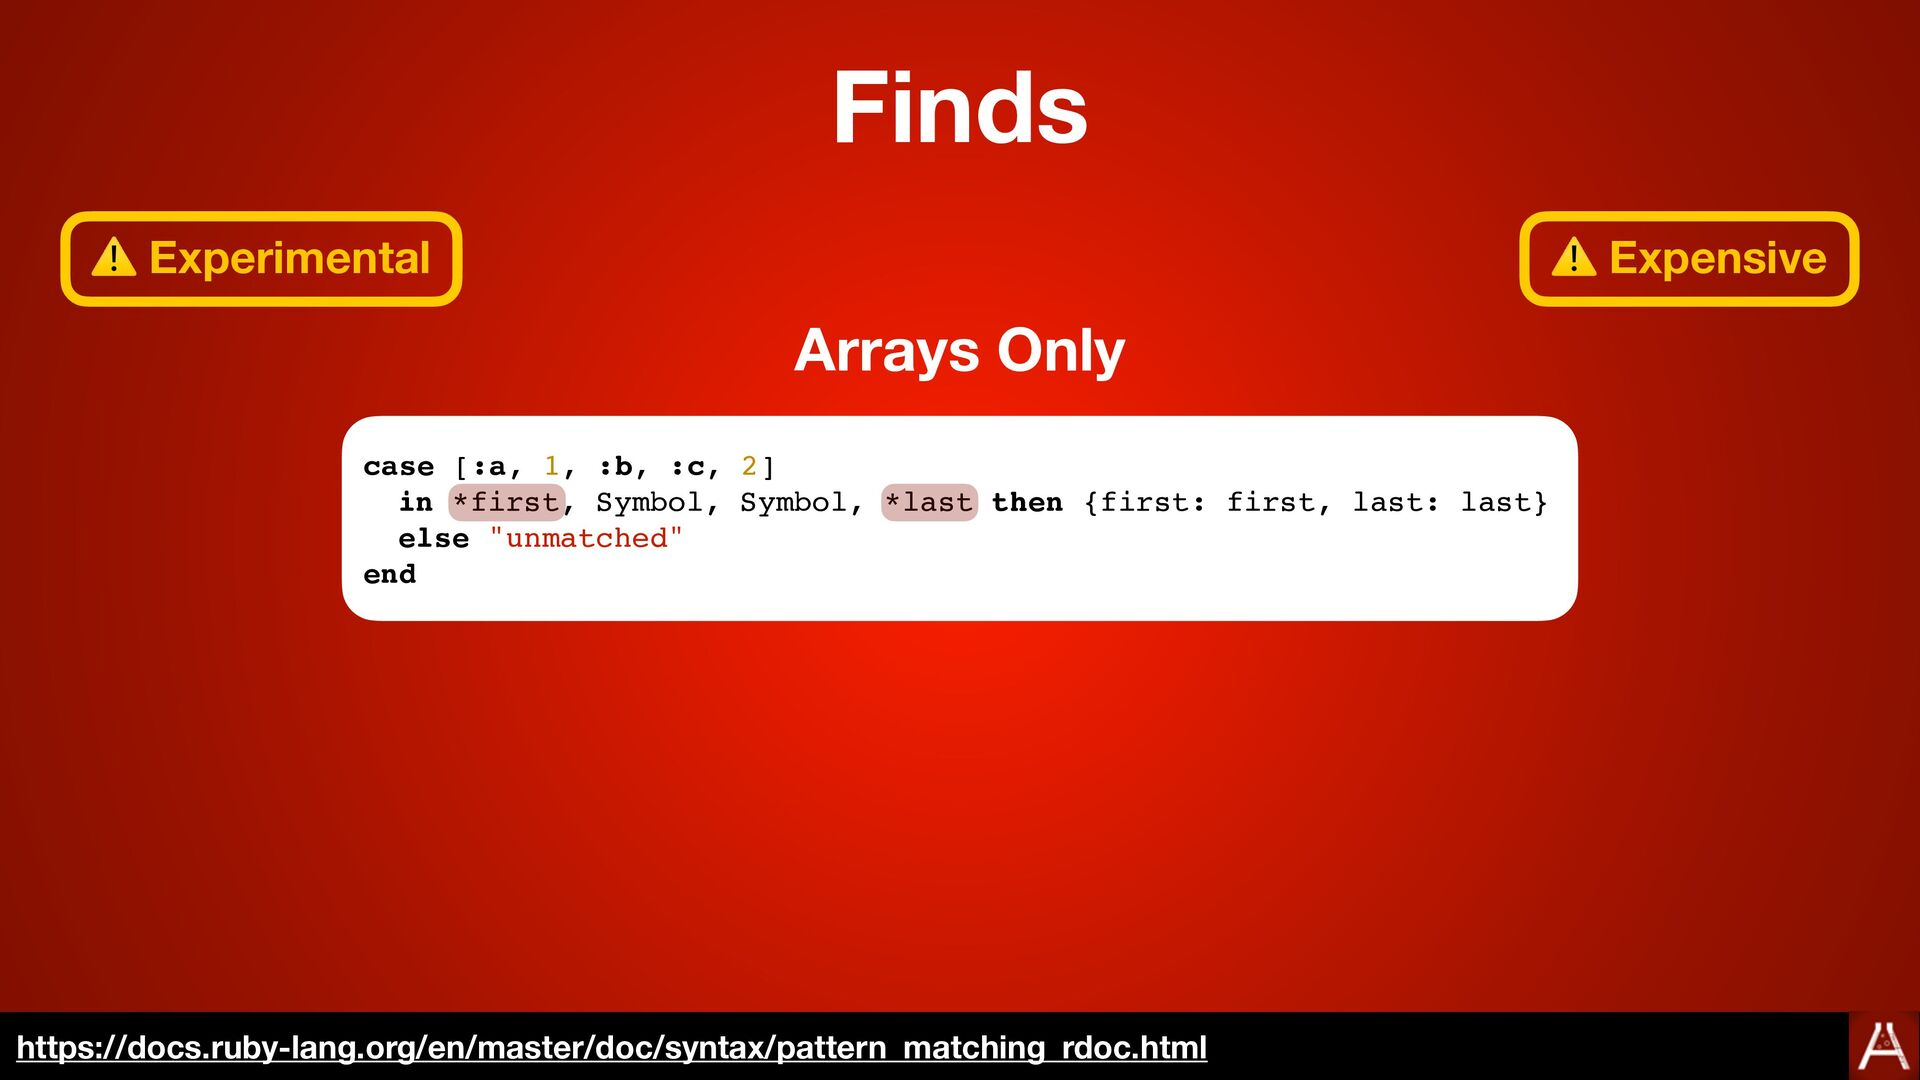 case [:a, 1, :b, :c, 2 ]  in *first, Symbol, Sy...